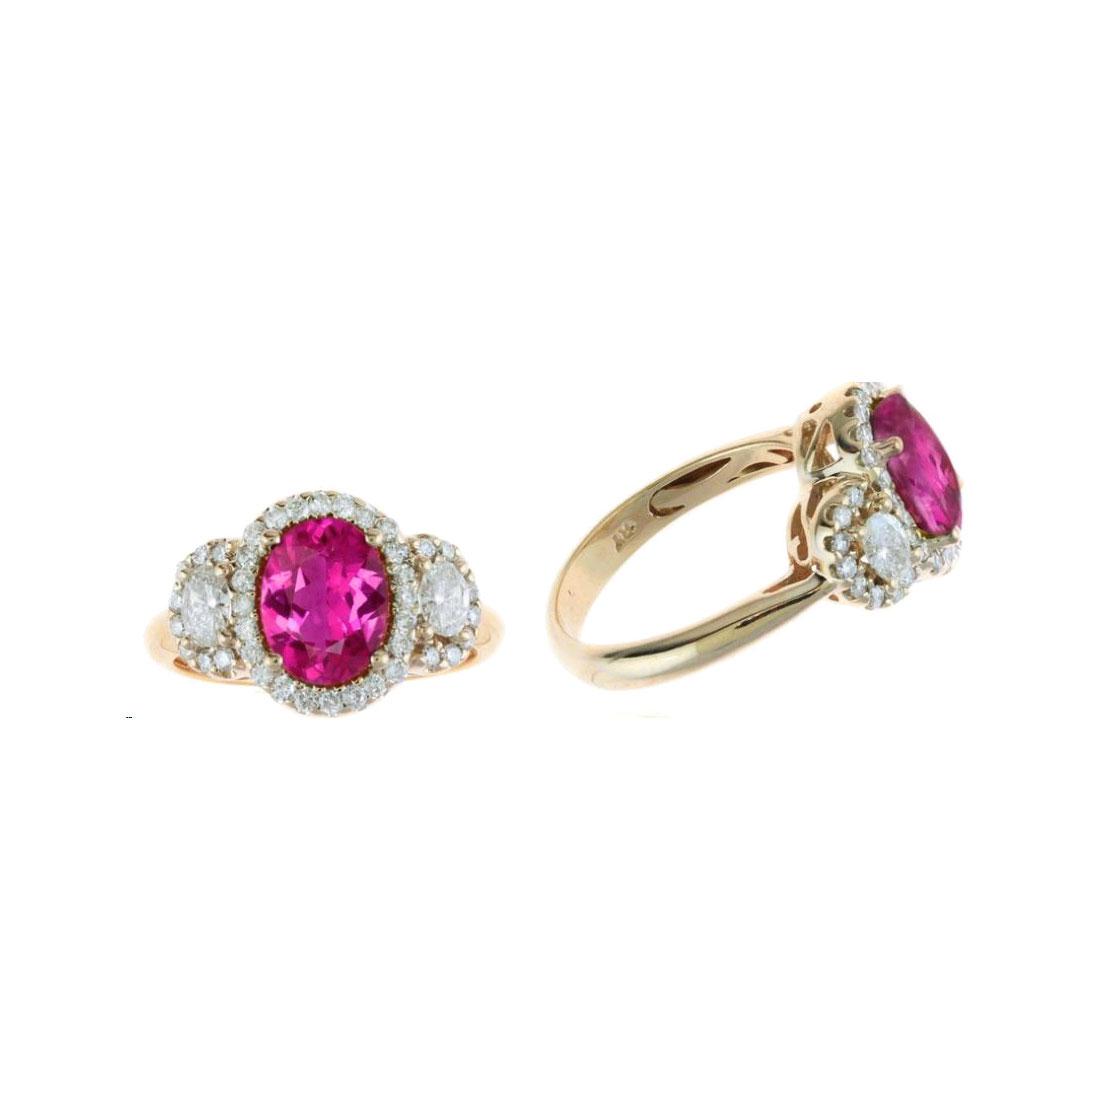 Ryan Gems 14 Karat Rose Gold Oval Pink Sapphire and Diamond Ring